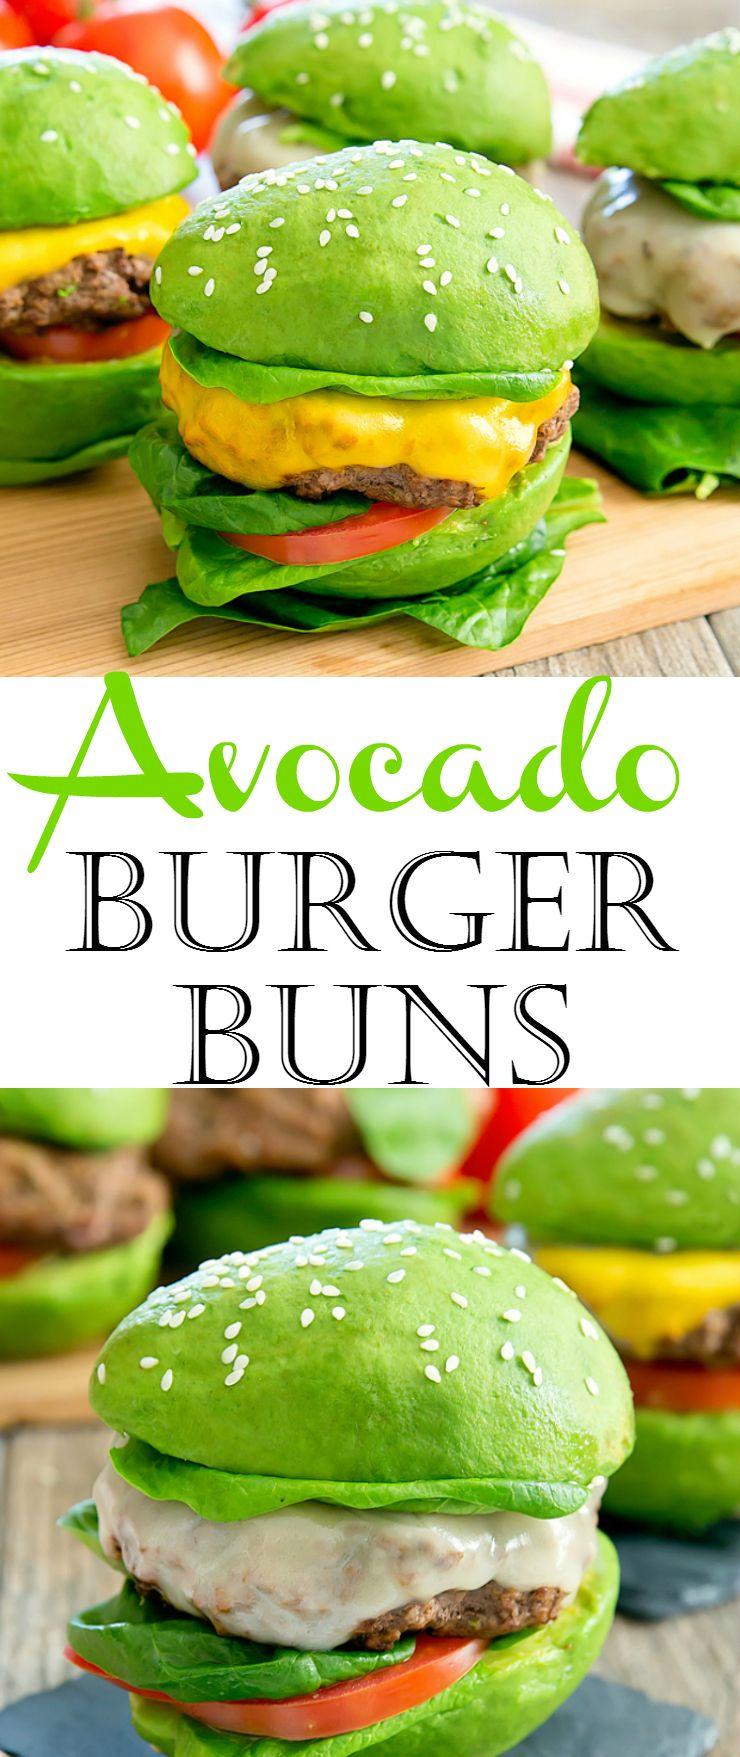 Avocado Burger Buns Recipe Avocado Burger Burger Buns Burger Buns Recipe